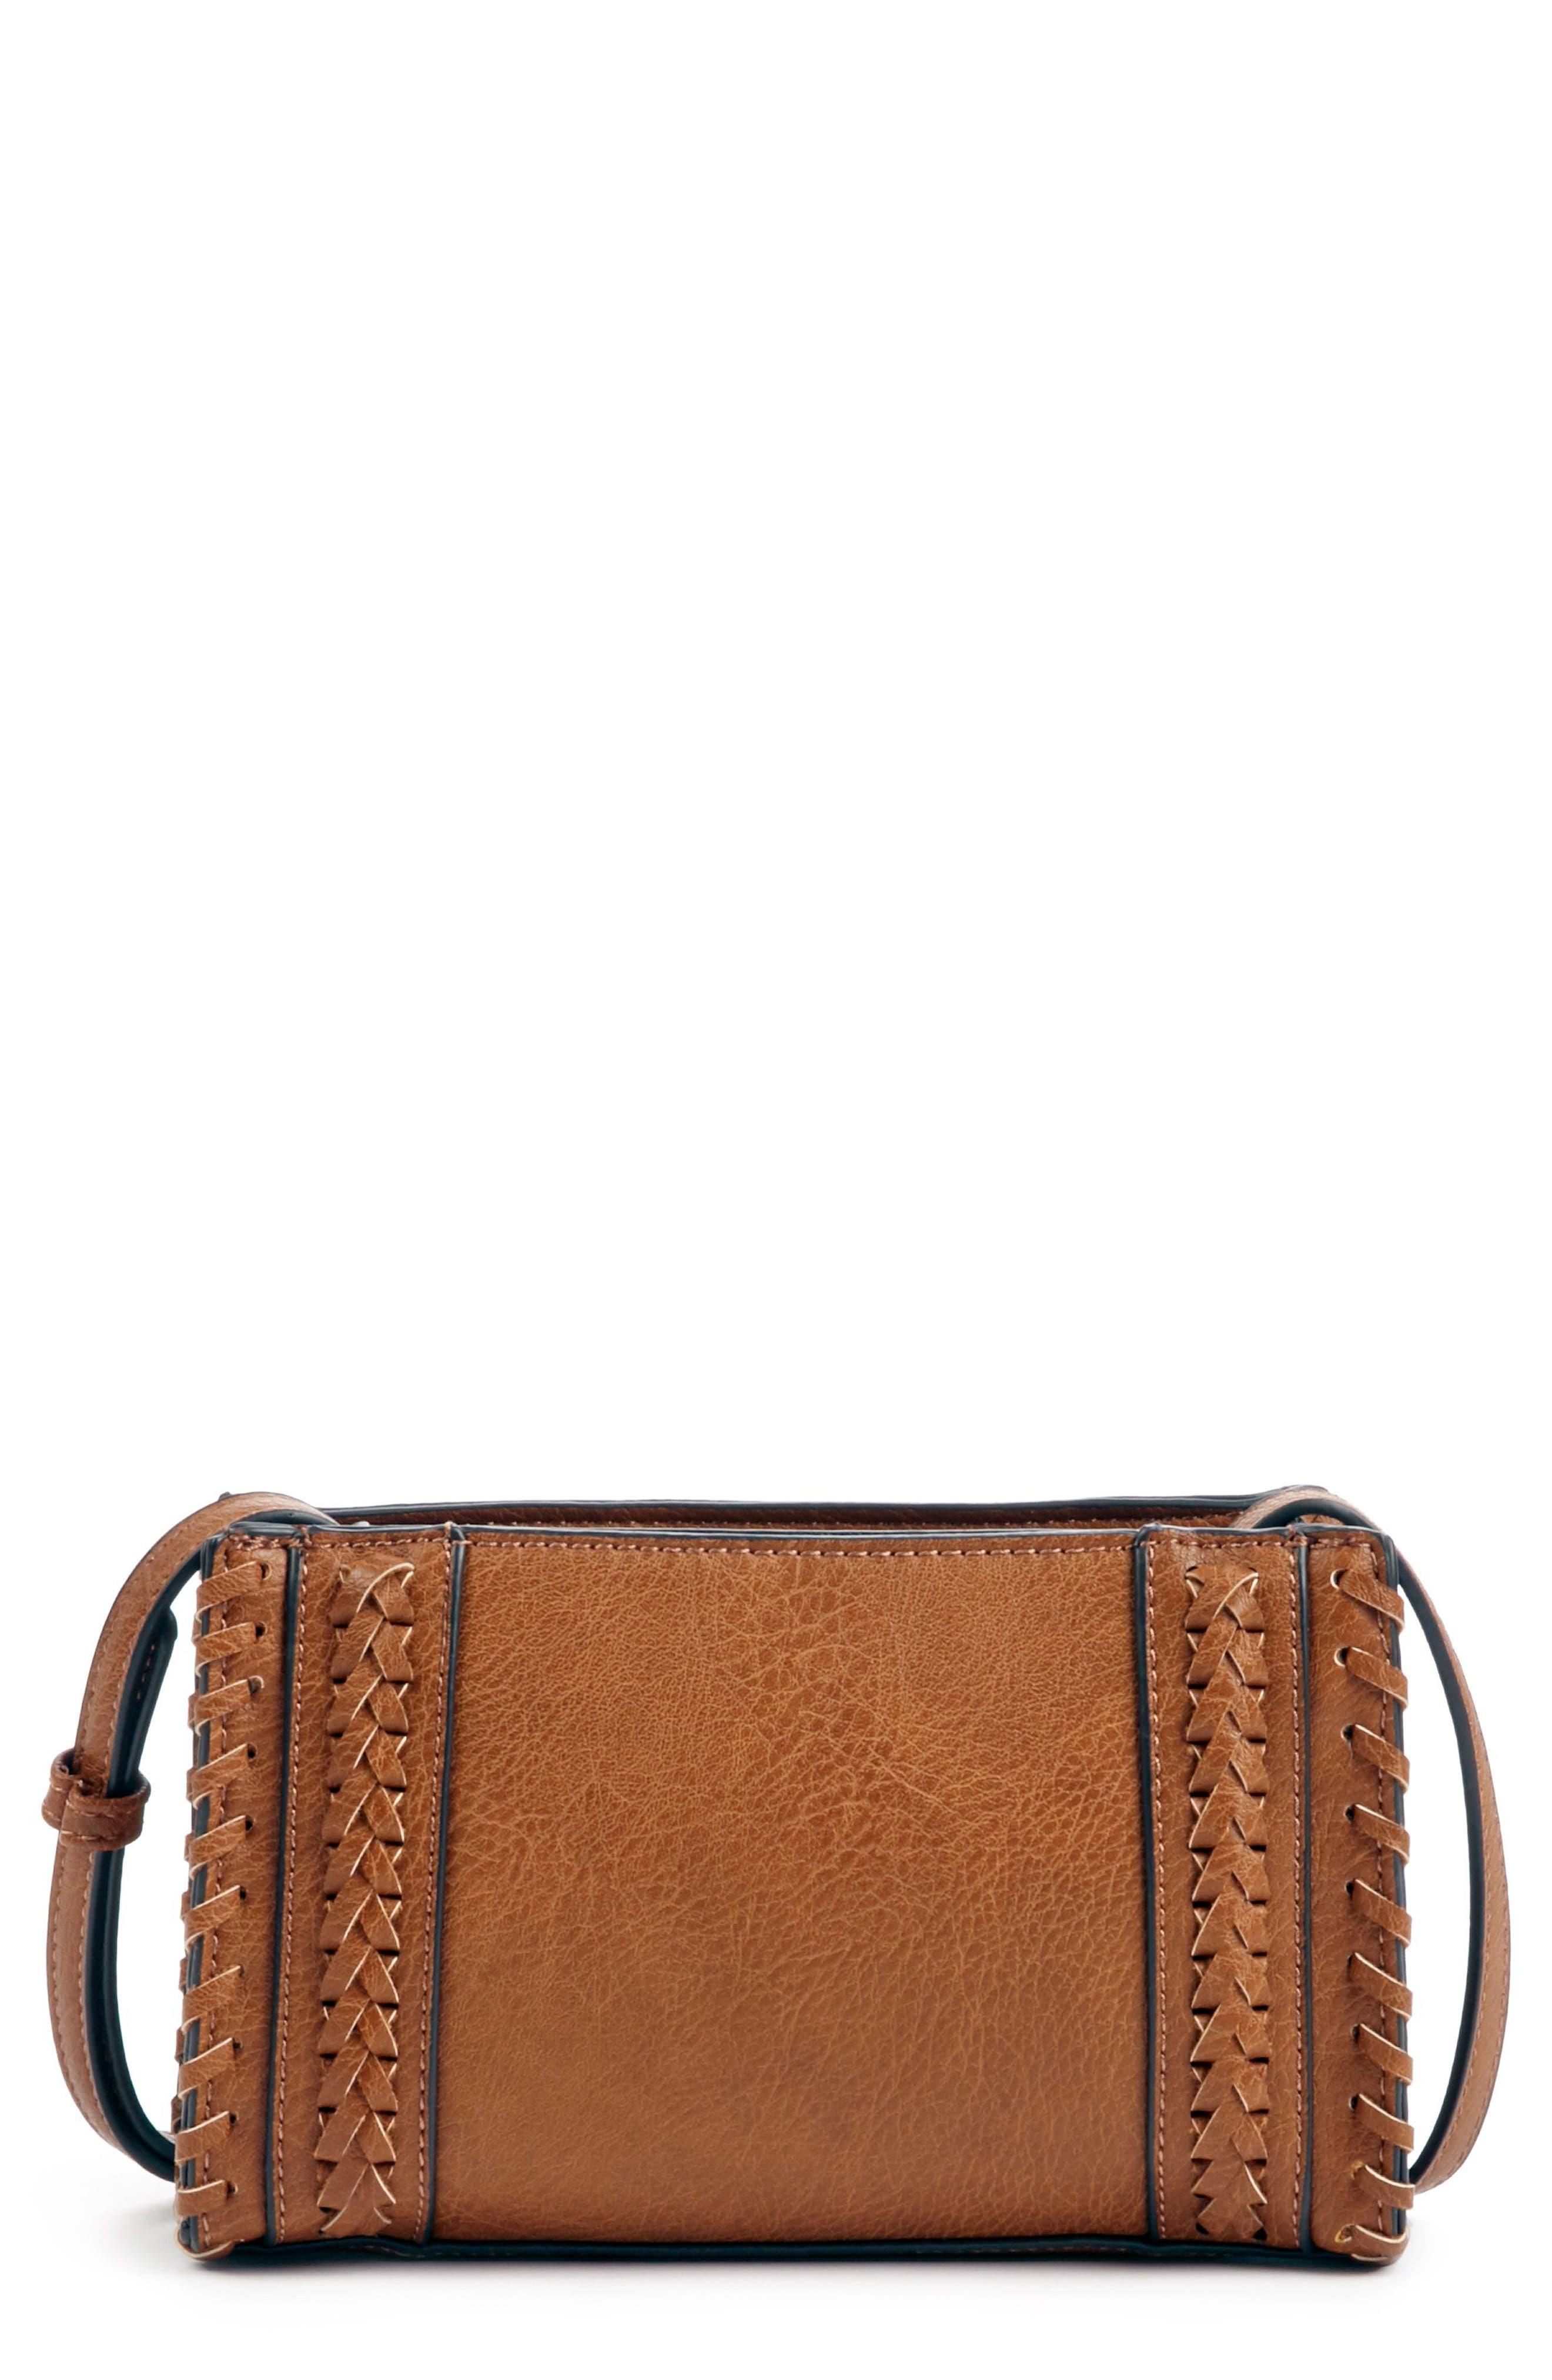 SOLE SOCIETY,                             Destin Faux Leather Crossbody Bag,                             Main thumbnail 1, color,                             230